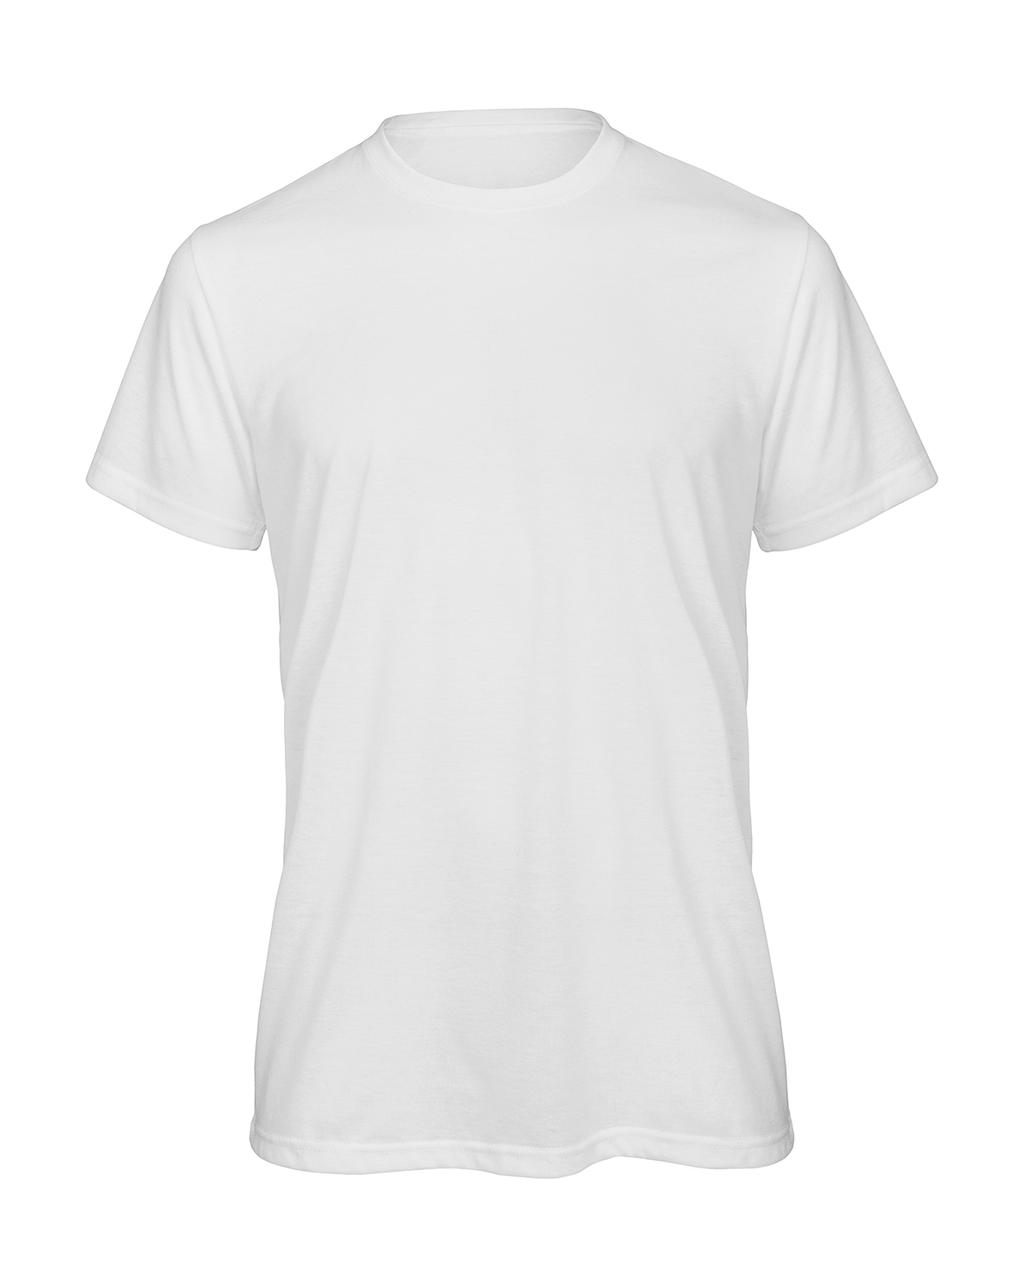 Sublimation/men T-Shirt - zvìtšit obrázek